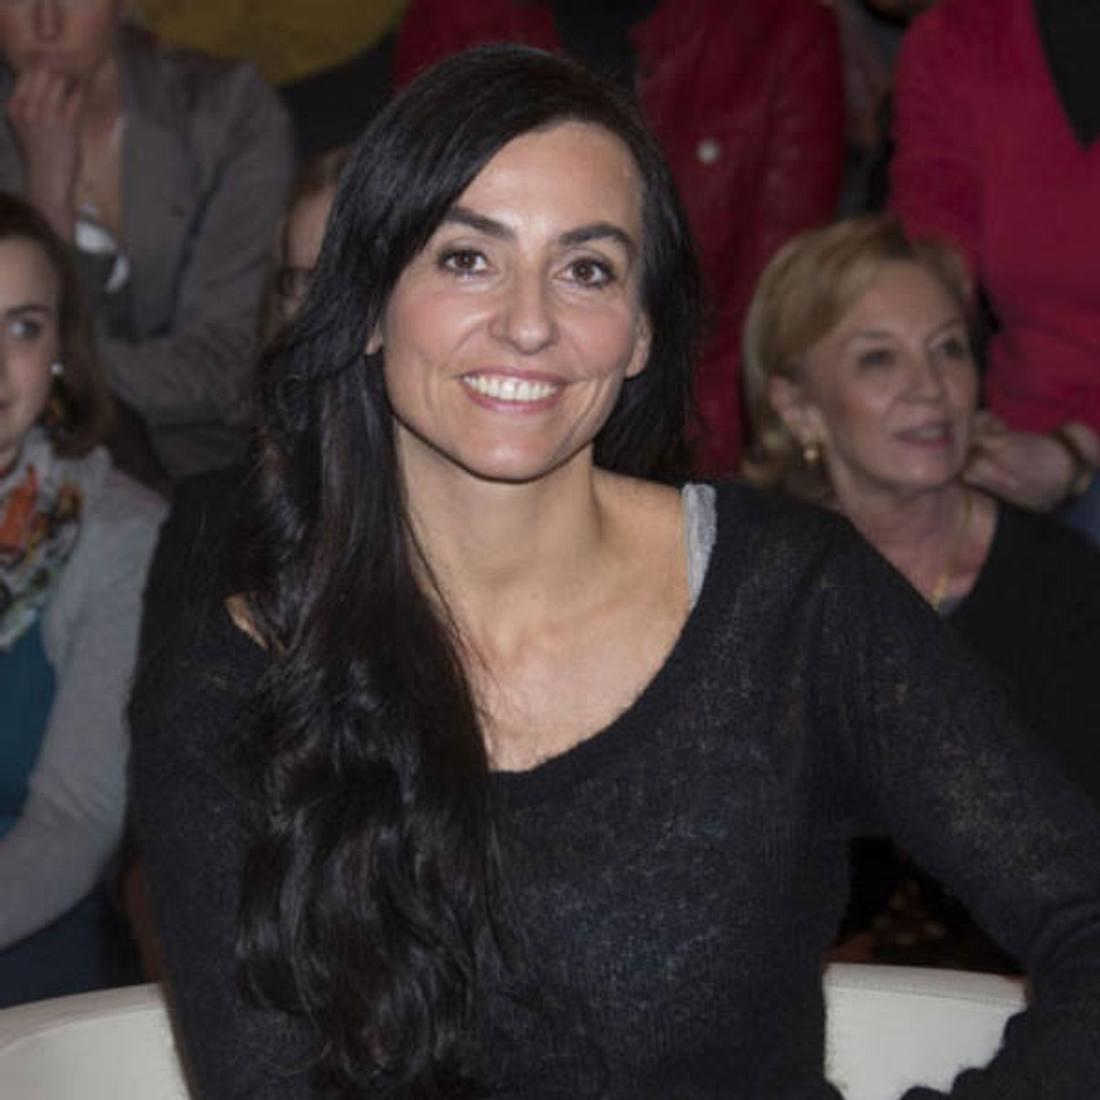 Kein TV-Comeback für Katharina Saalfrank